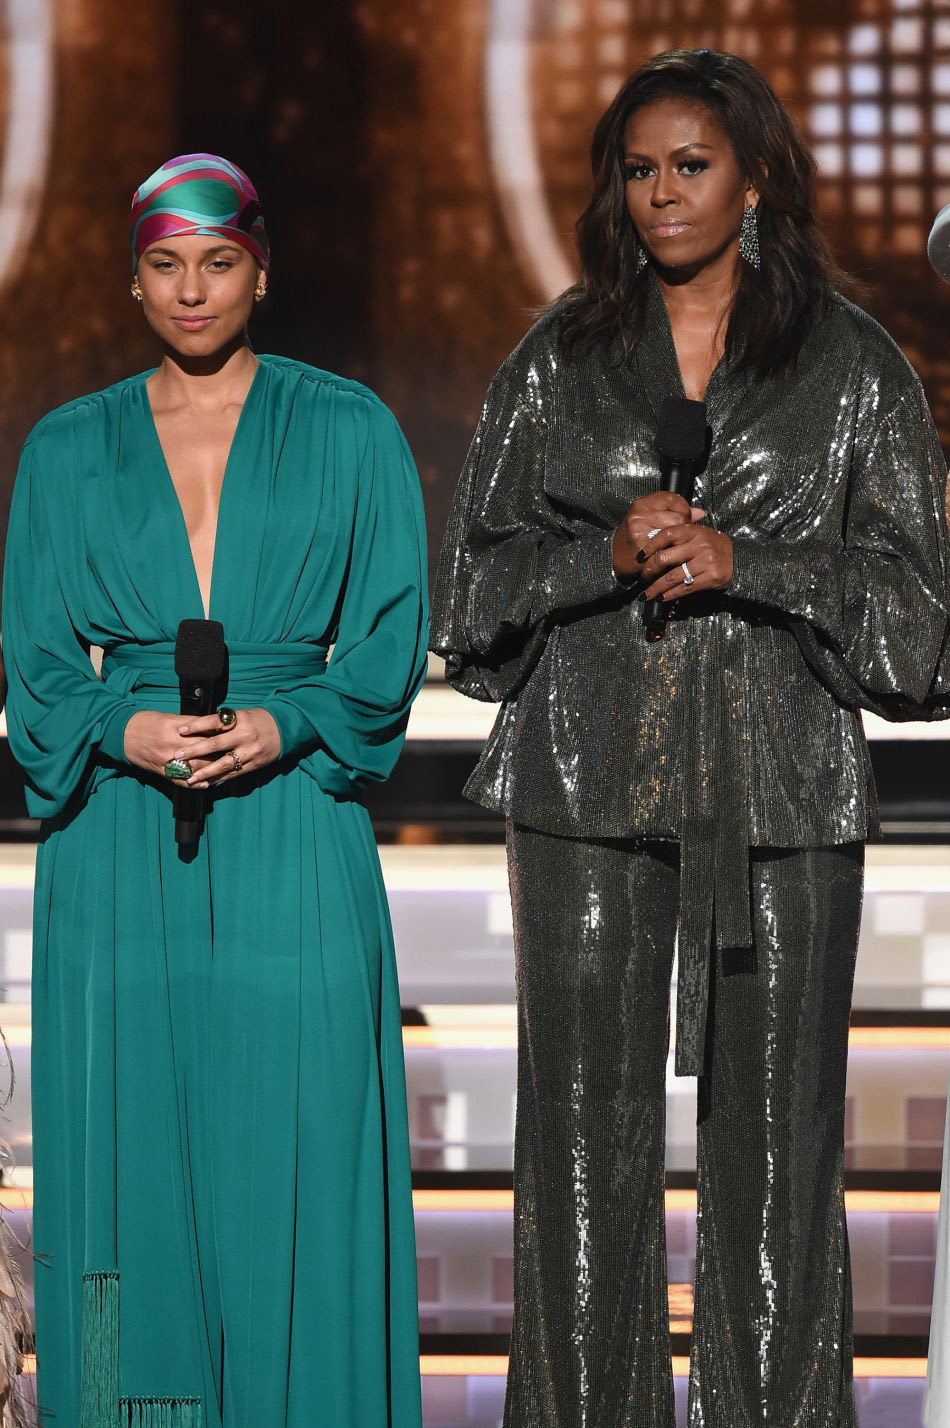 Grammy 2019: Meus looks favoritos dos famosos no tapete vermelho Alicia Keys Michelle Obama